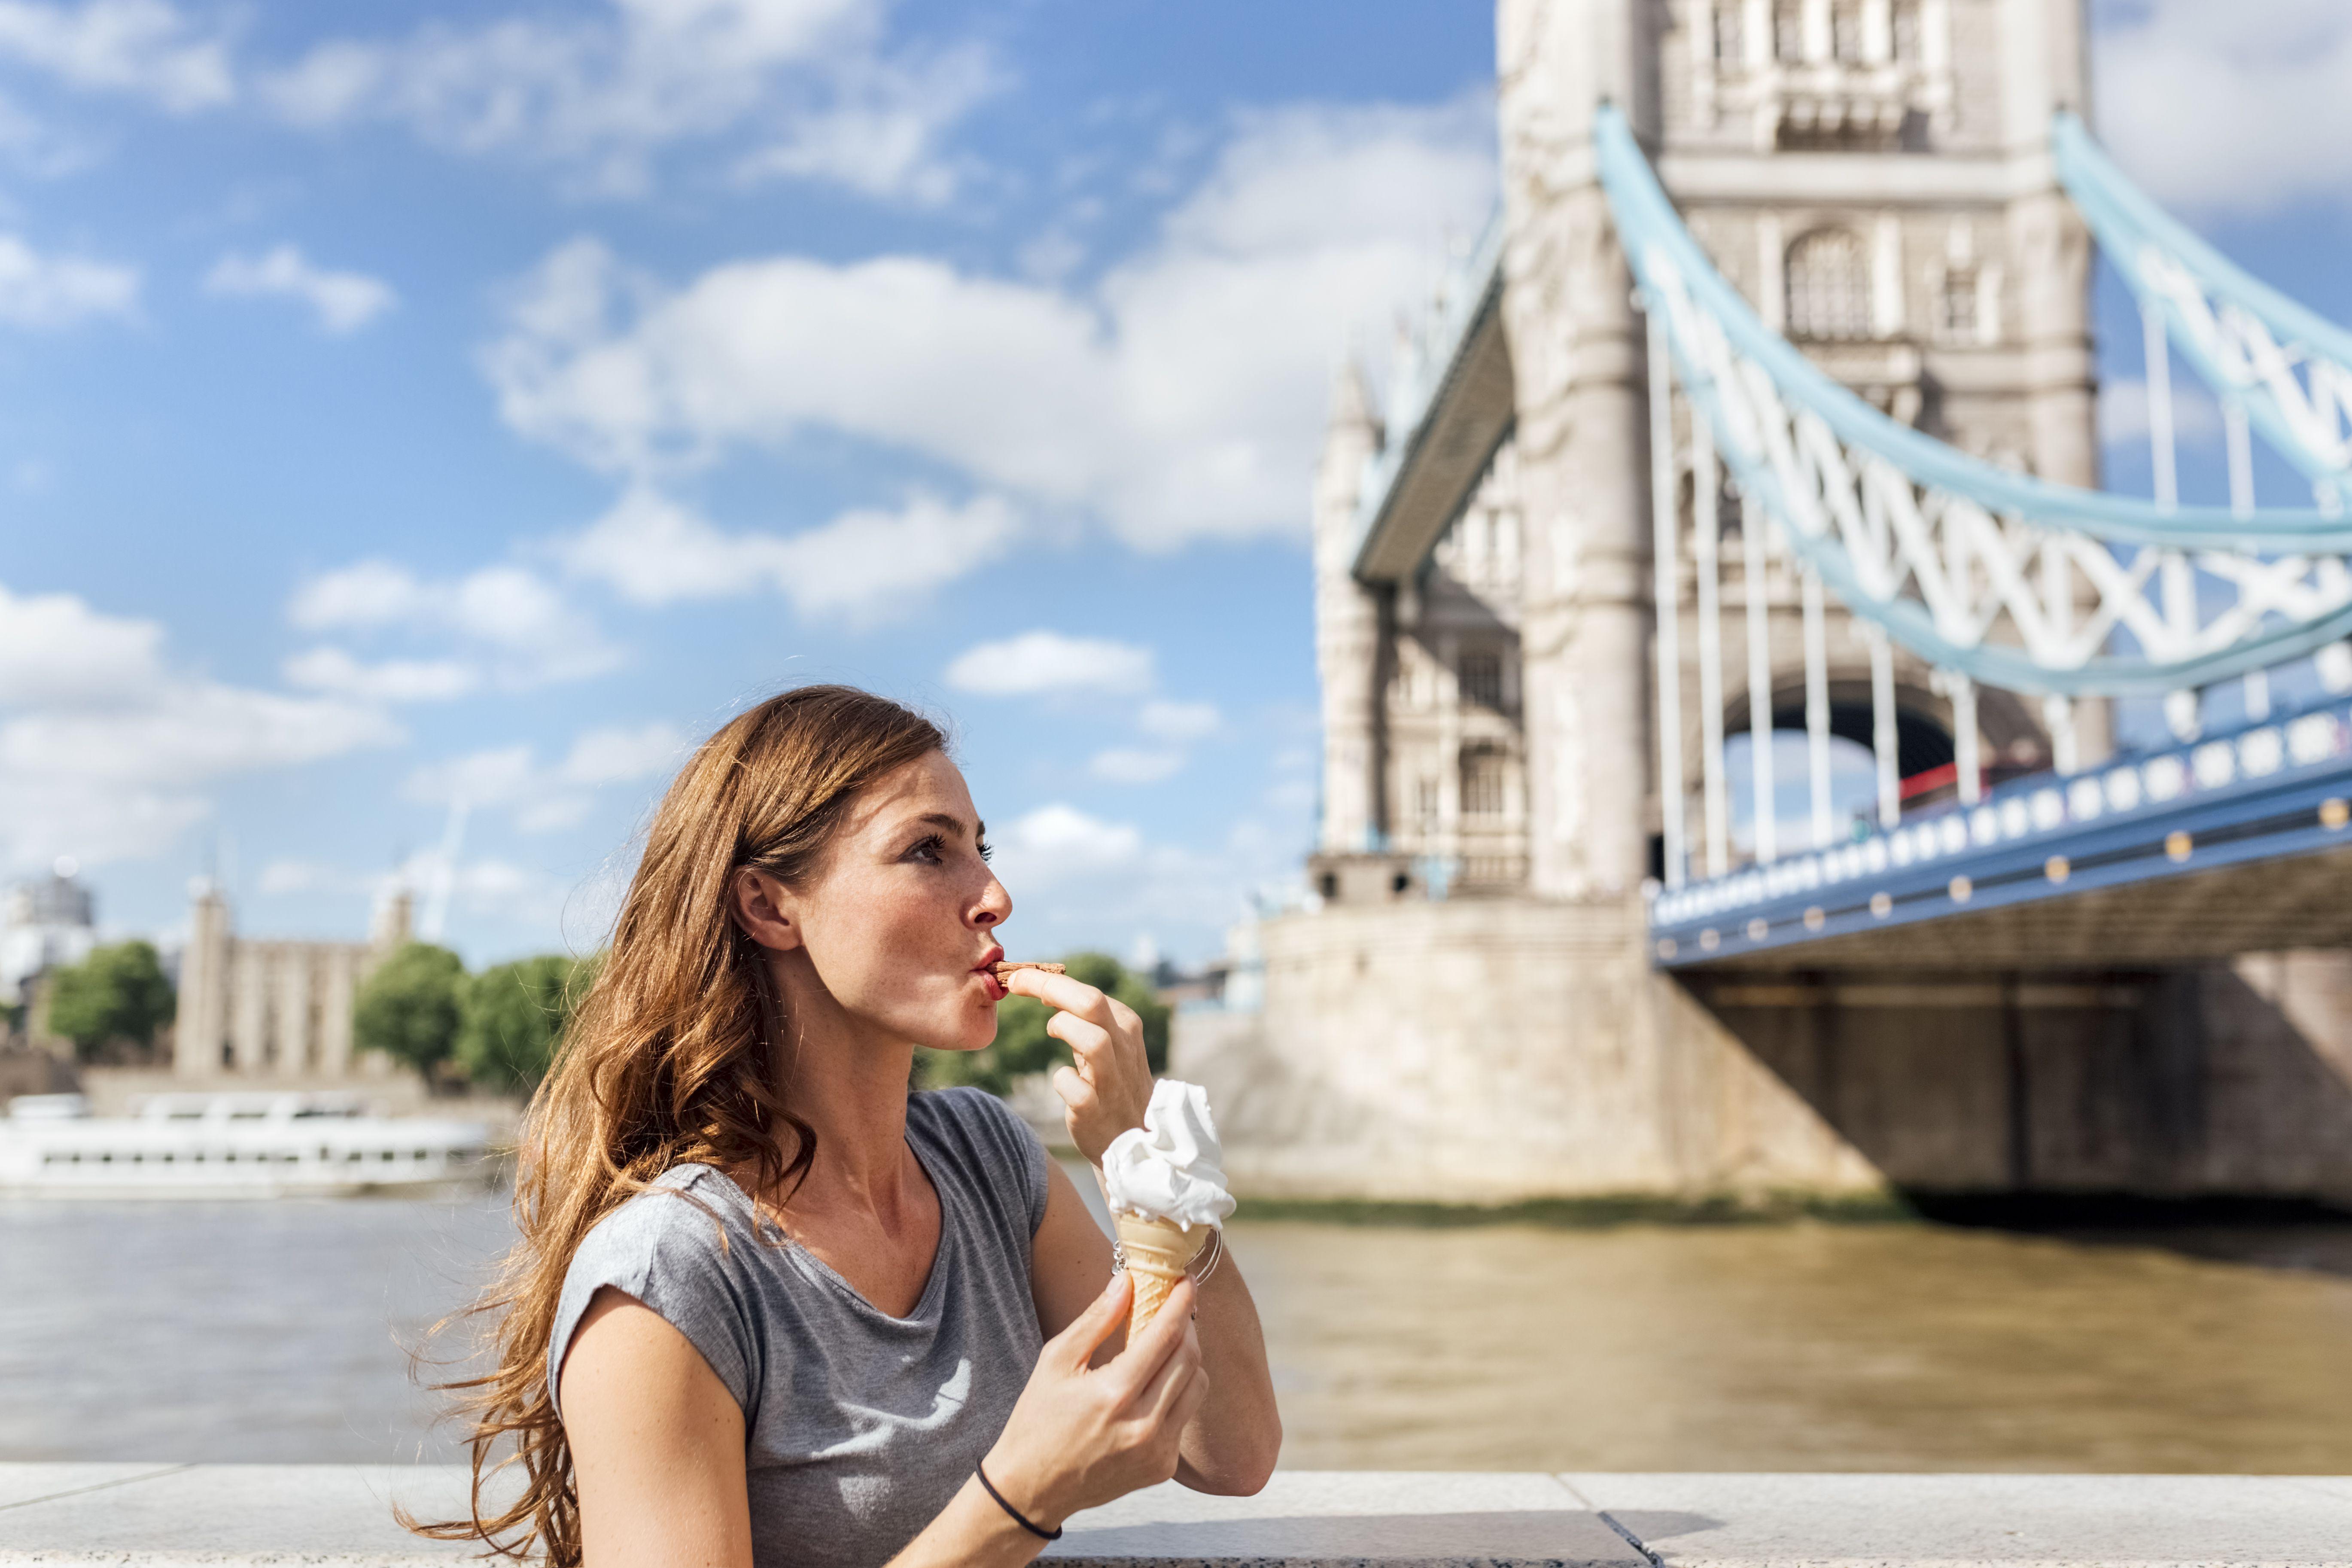 Cheap Hotels Near Tower Of London